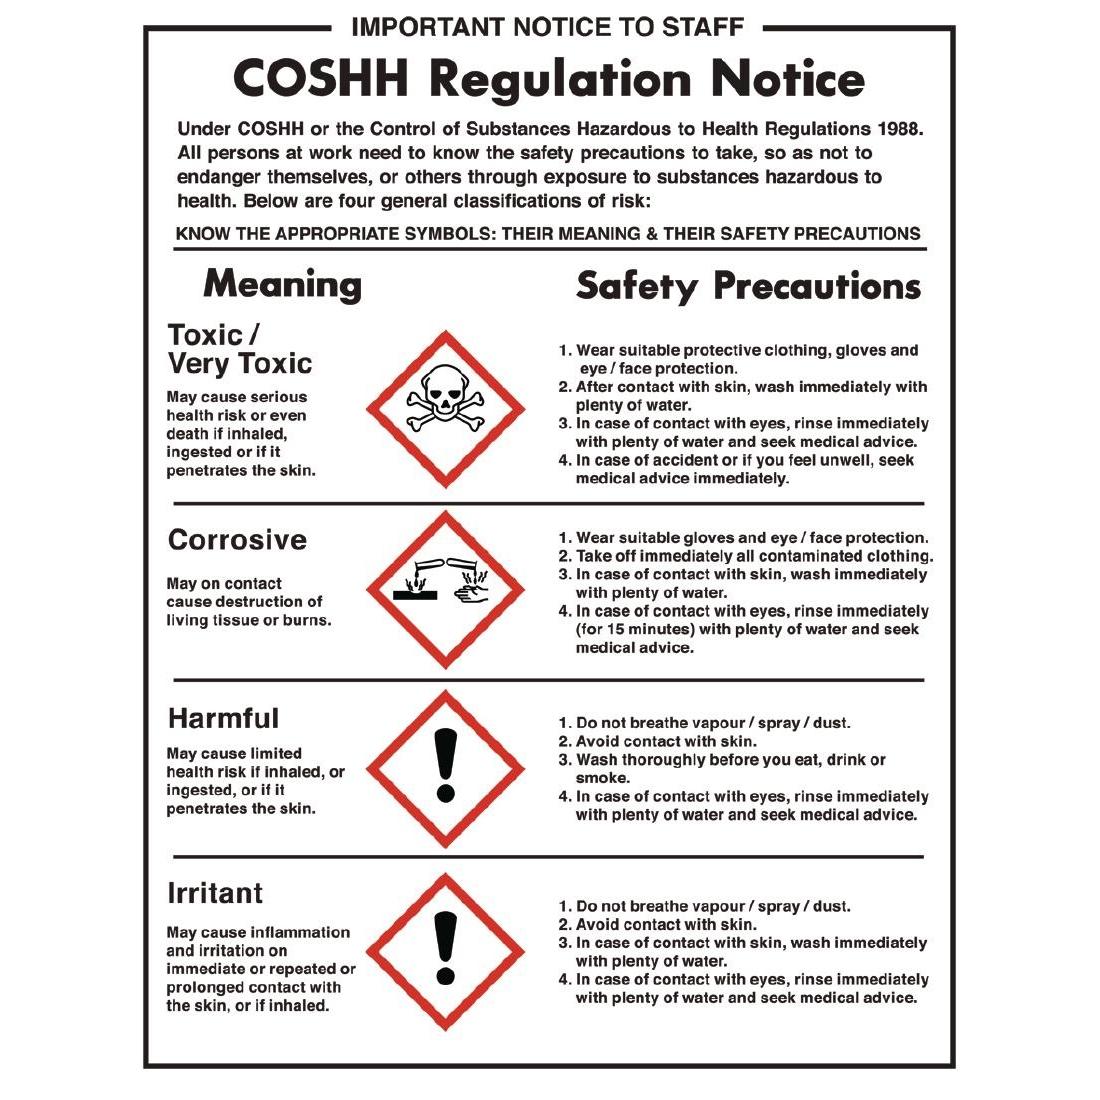 Coshh Regulations Sign